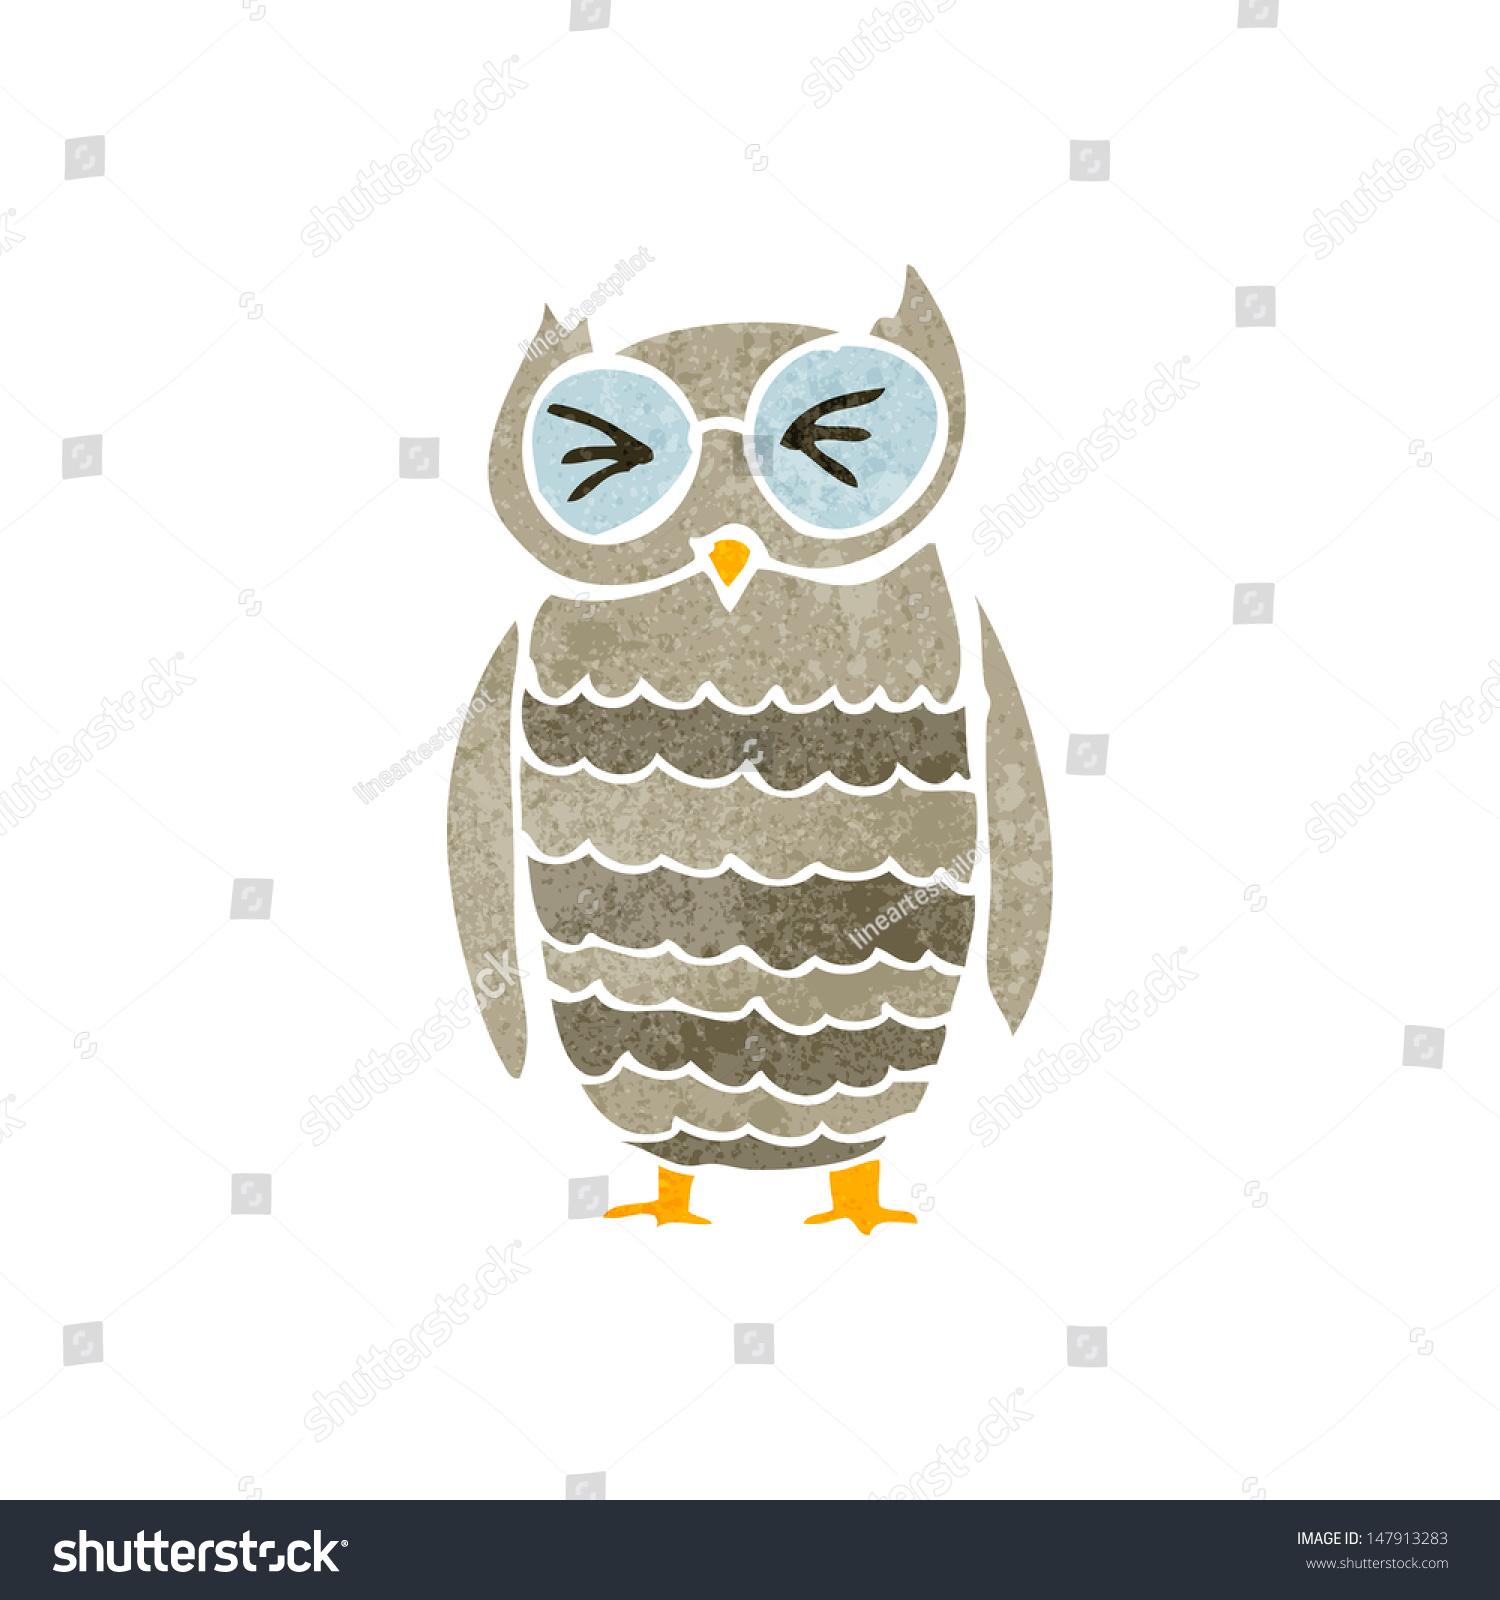 Retro owl cartoon - photo#3